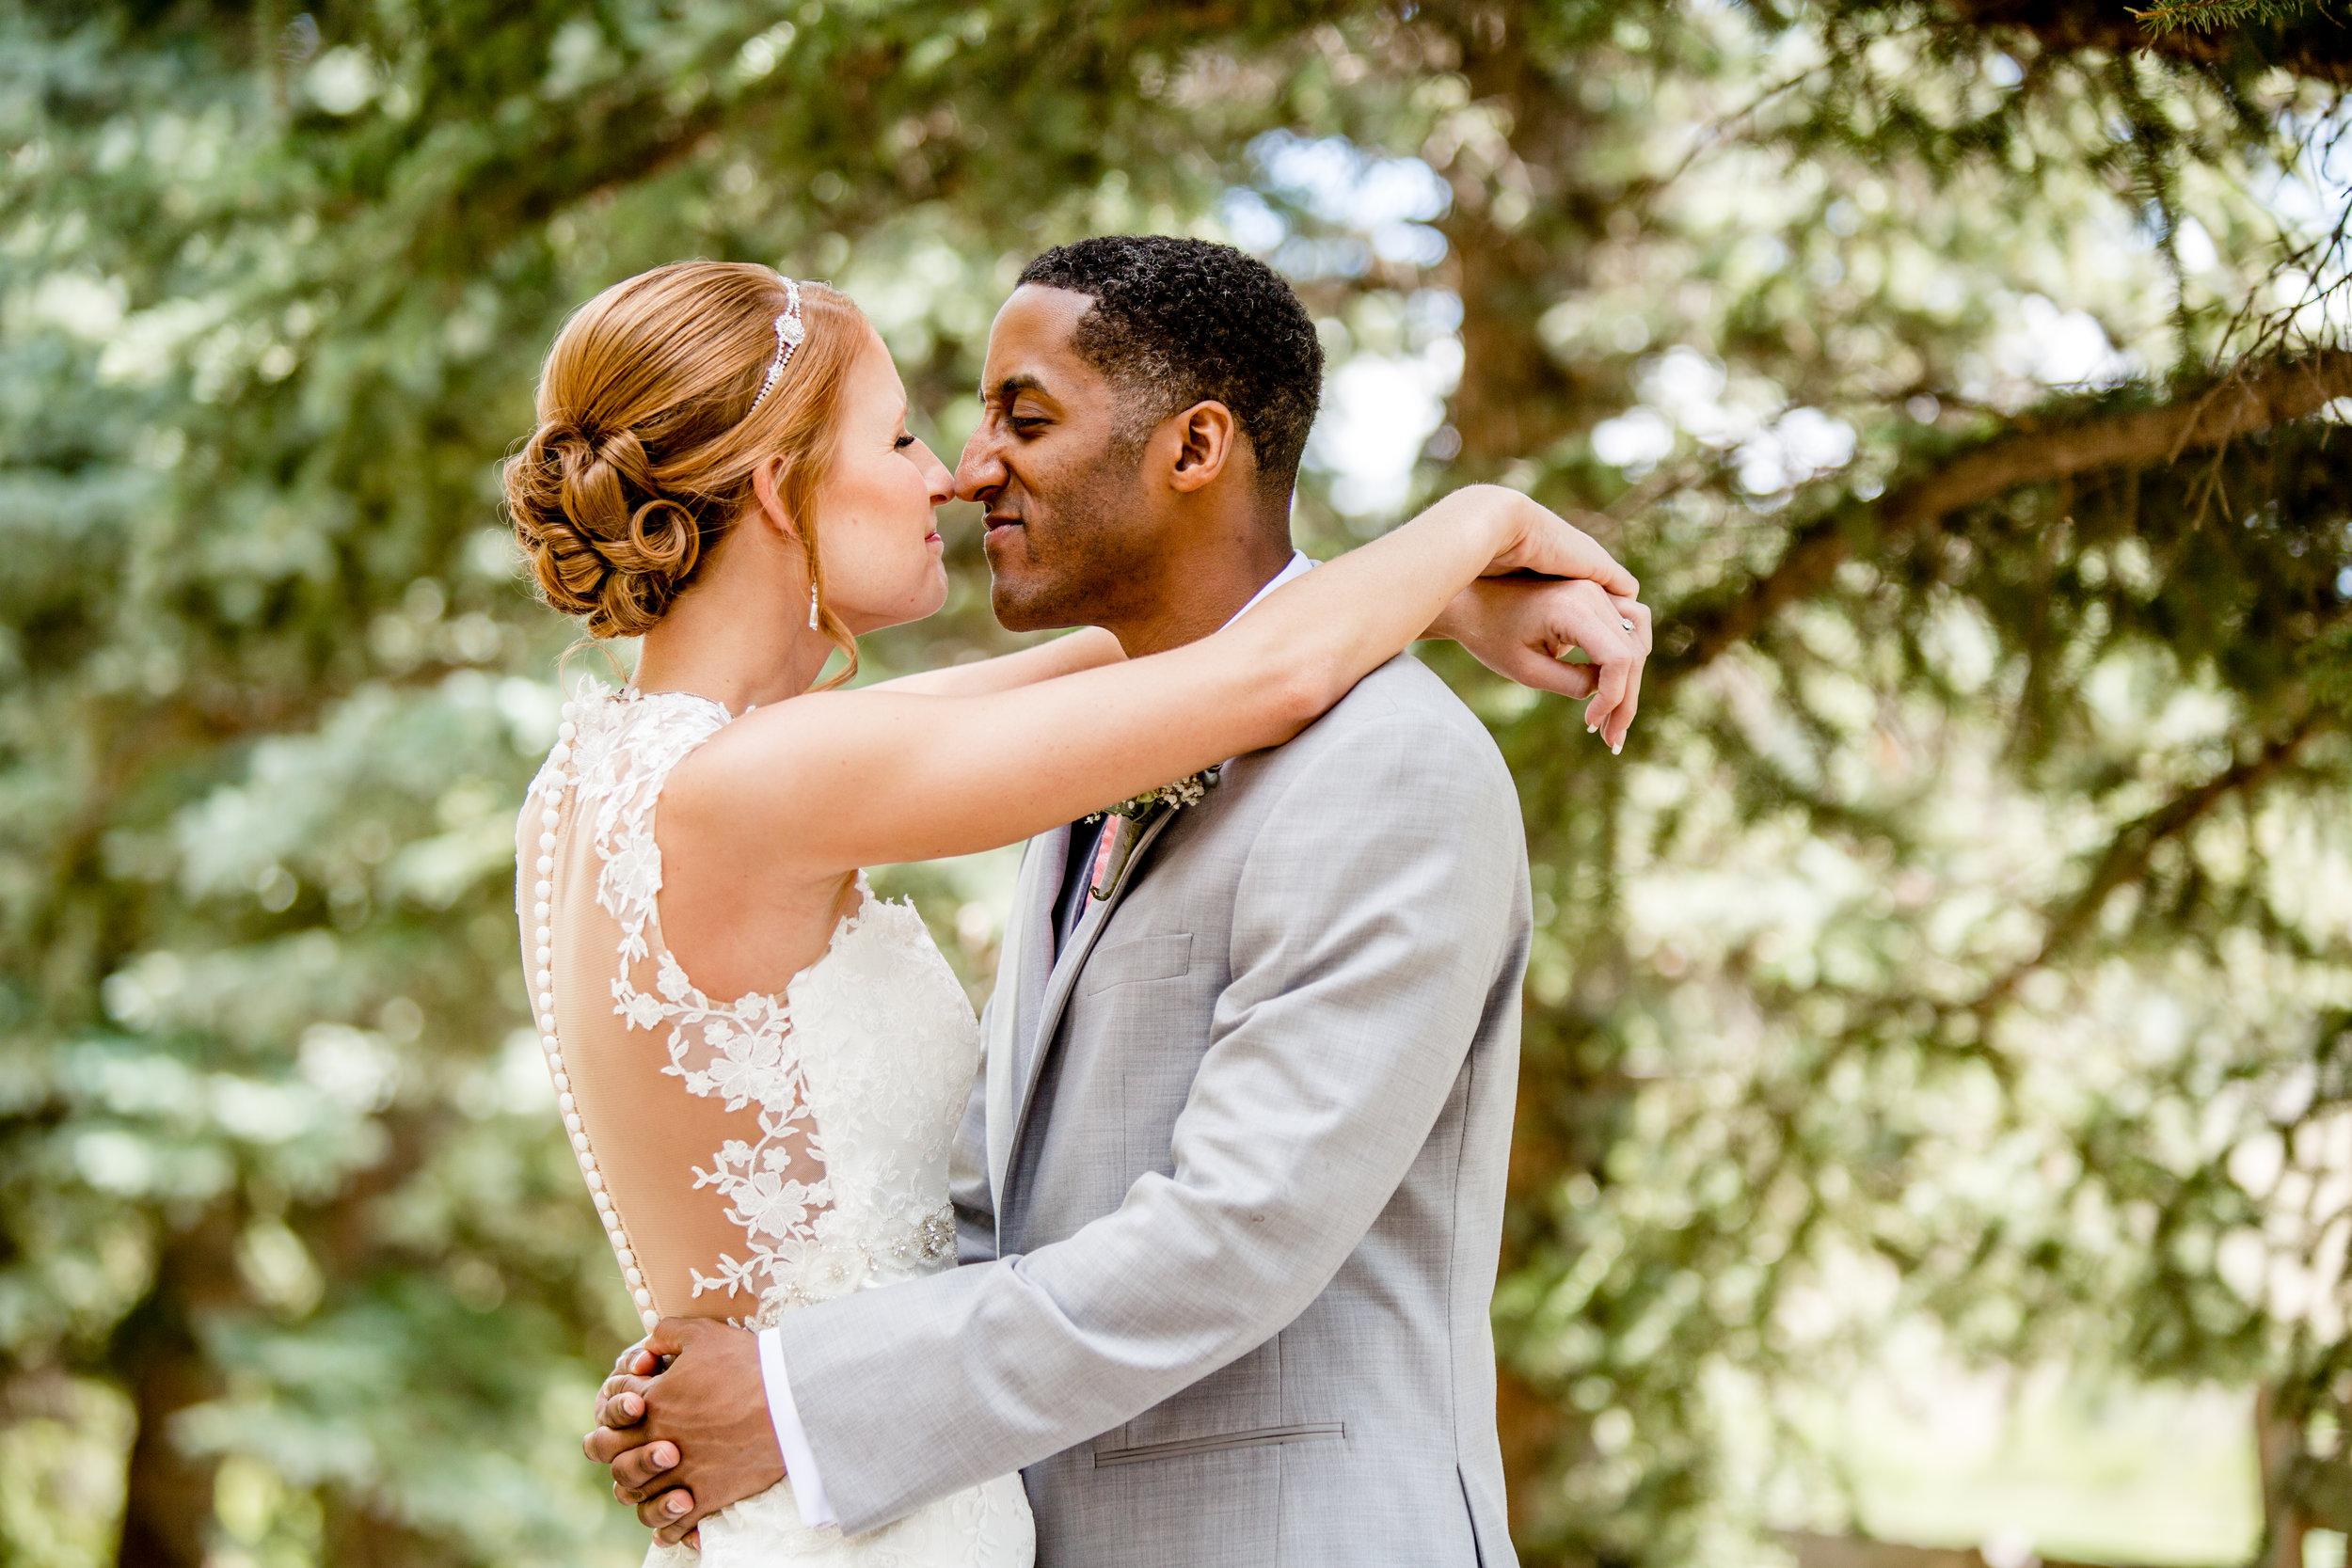 wedding-hair-Denver-updo-artist-bohemian-hairstyle